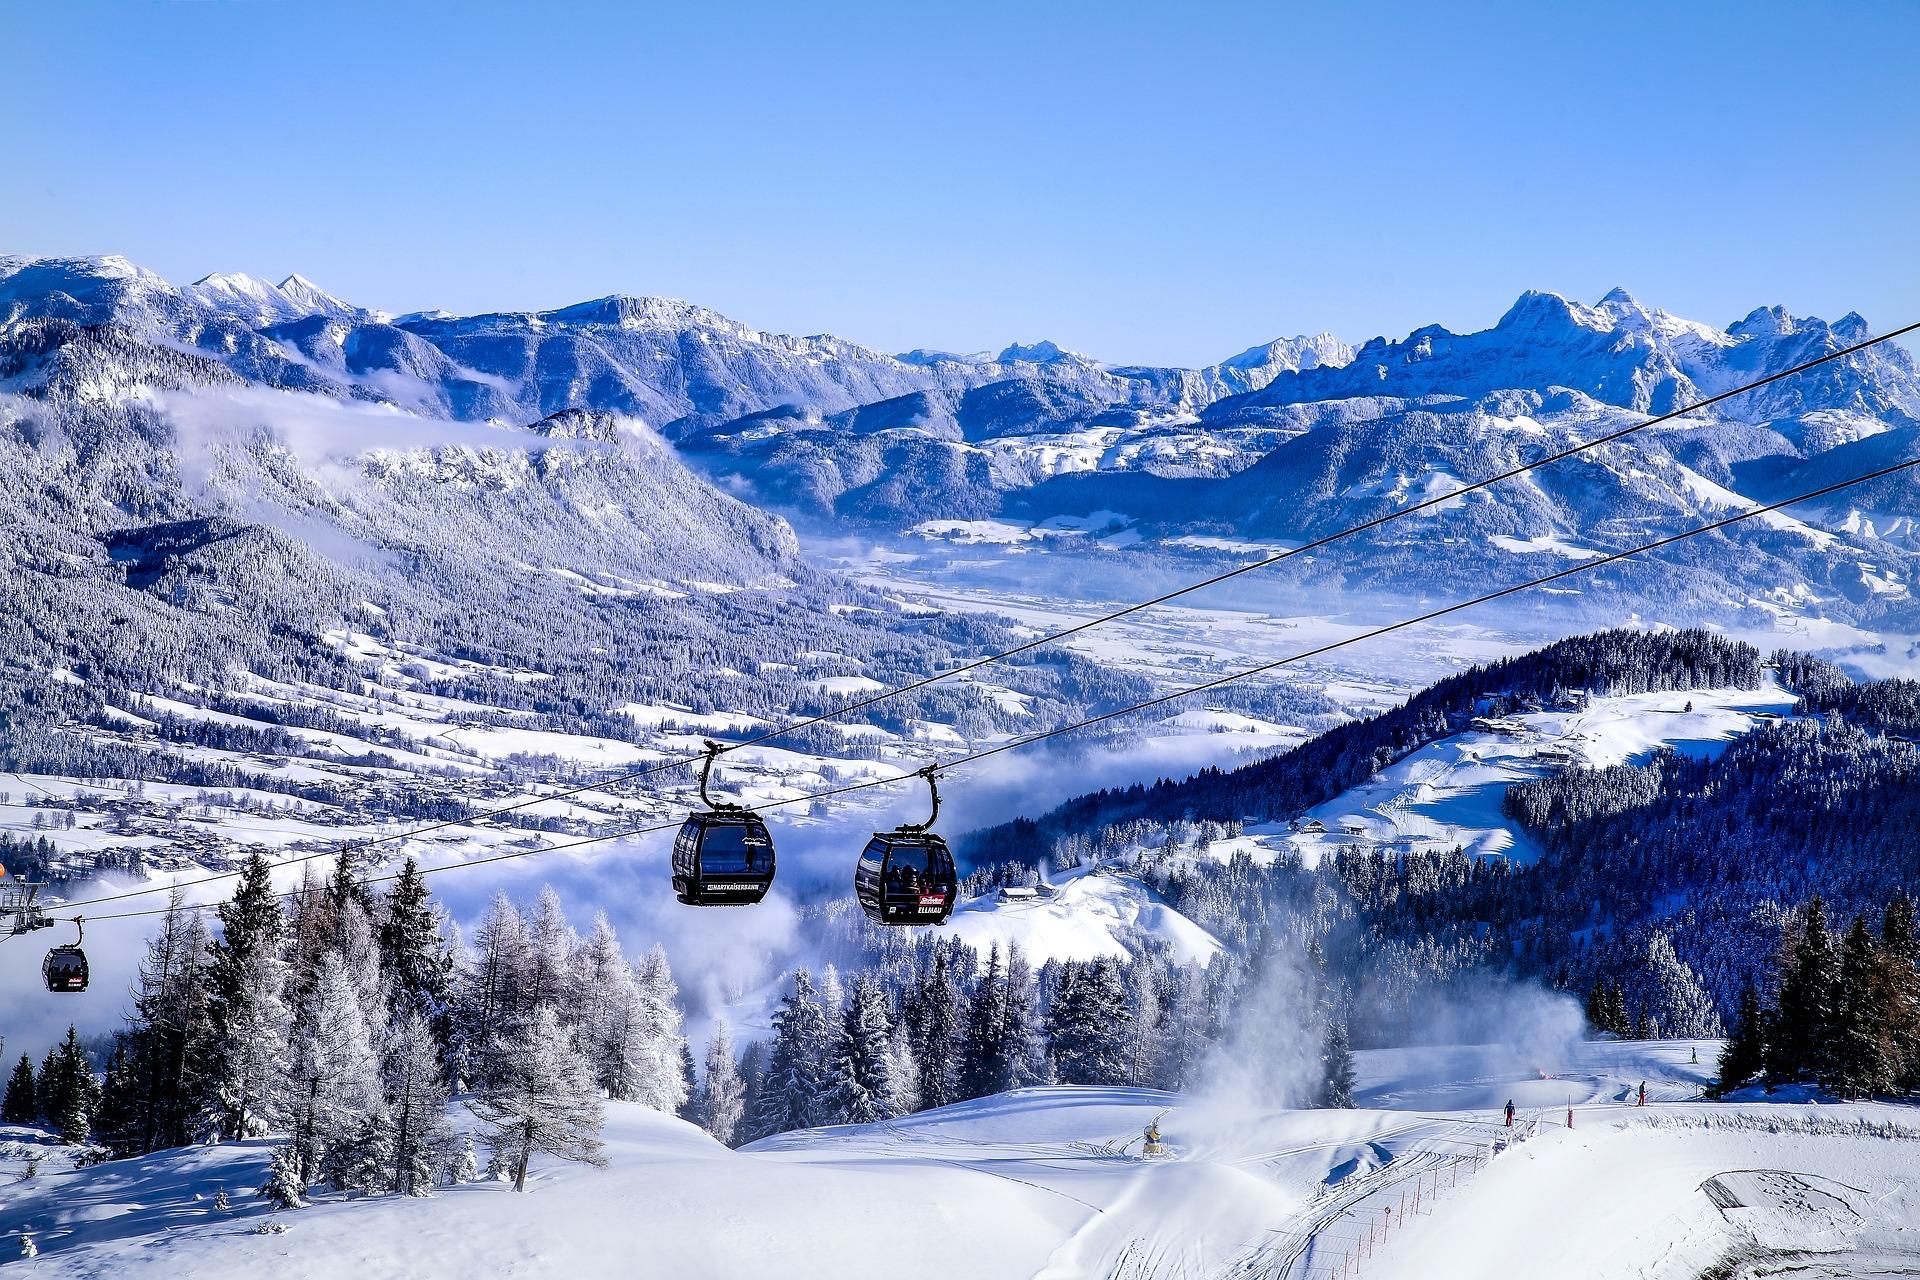 https://pixabay.com/ja/オーストリア-チロル-ellmau-山-雪-ゴンドラ-パノラマ-3872979/